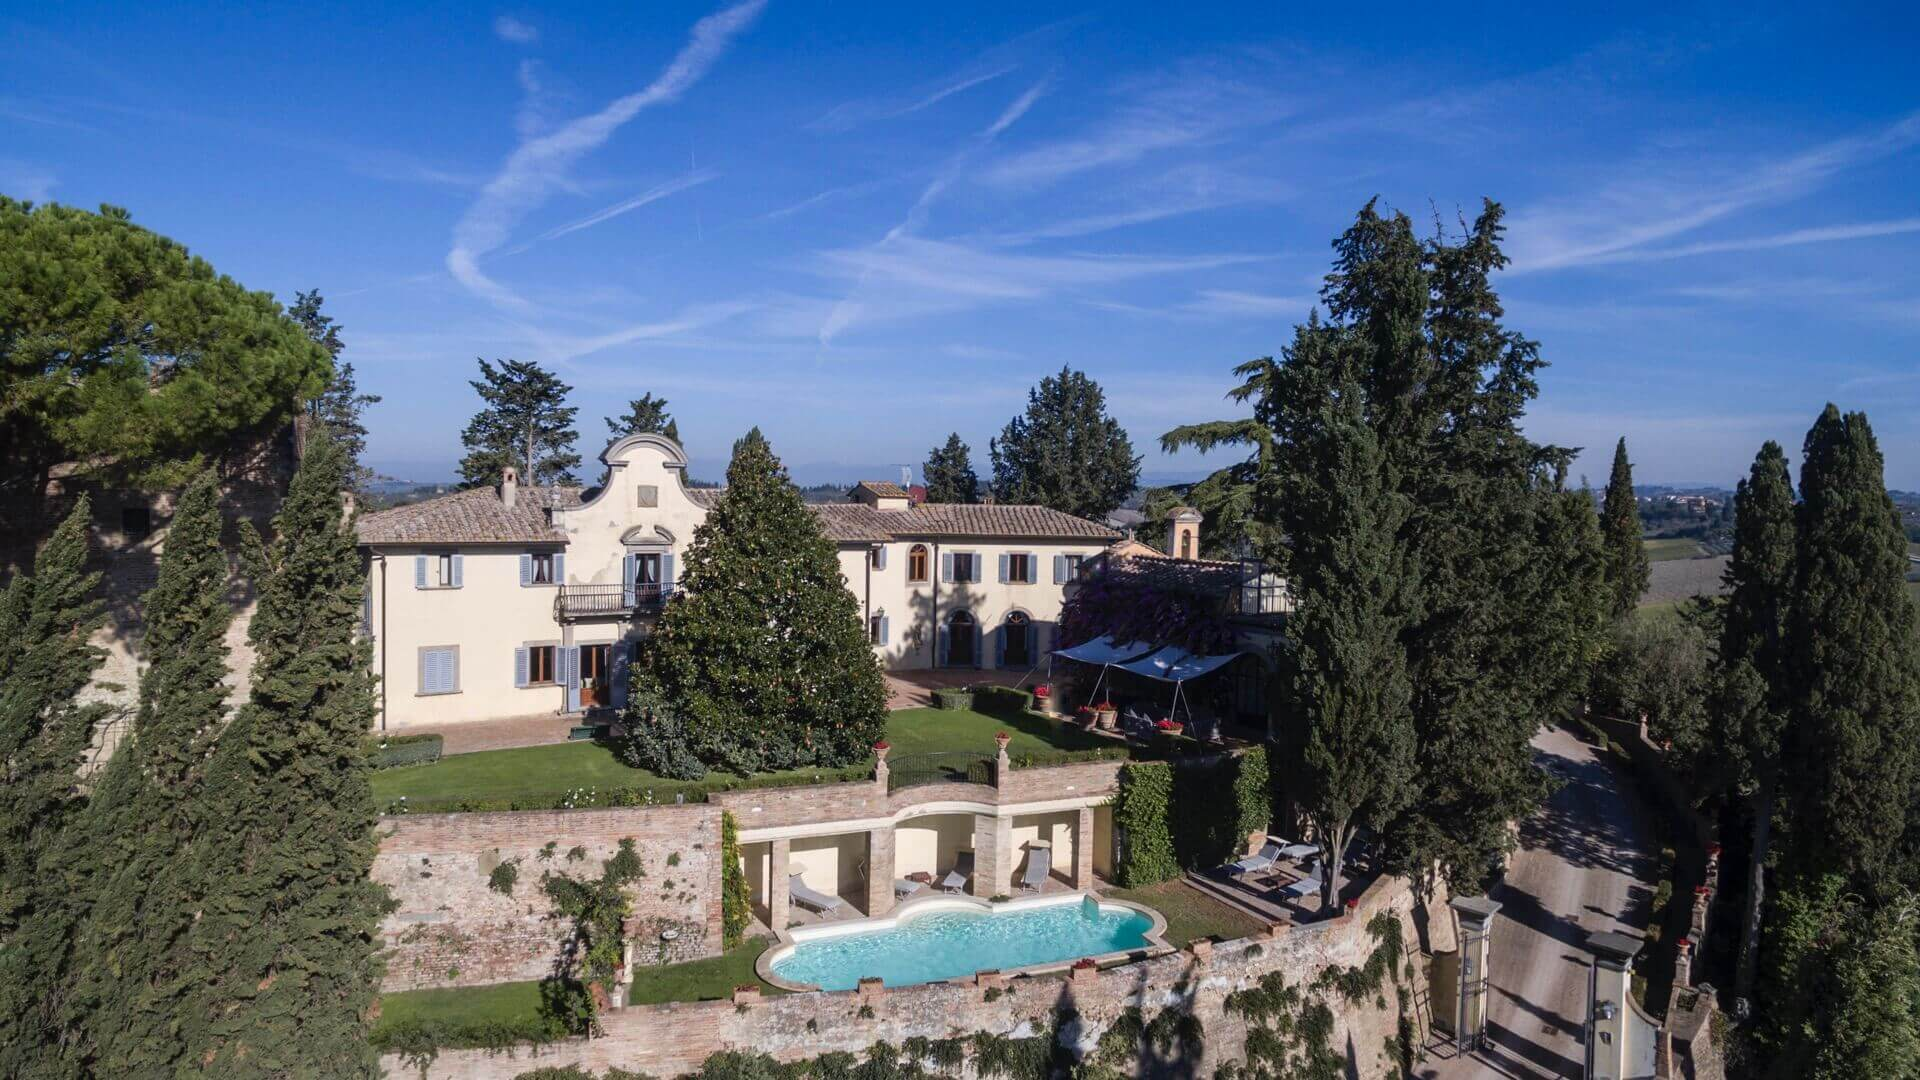 Villa Cabbiavoli Castelfiorentino Florence Tuscany